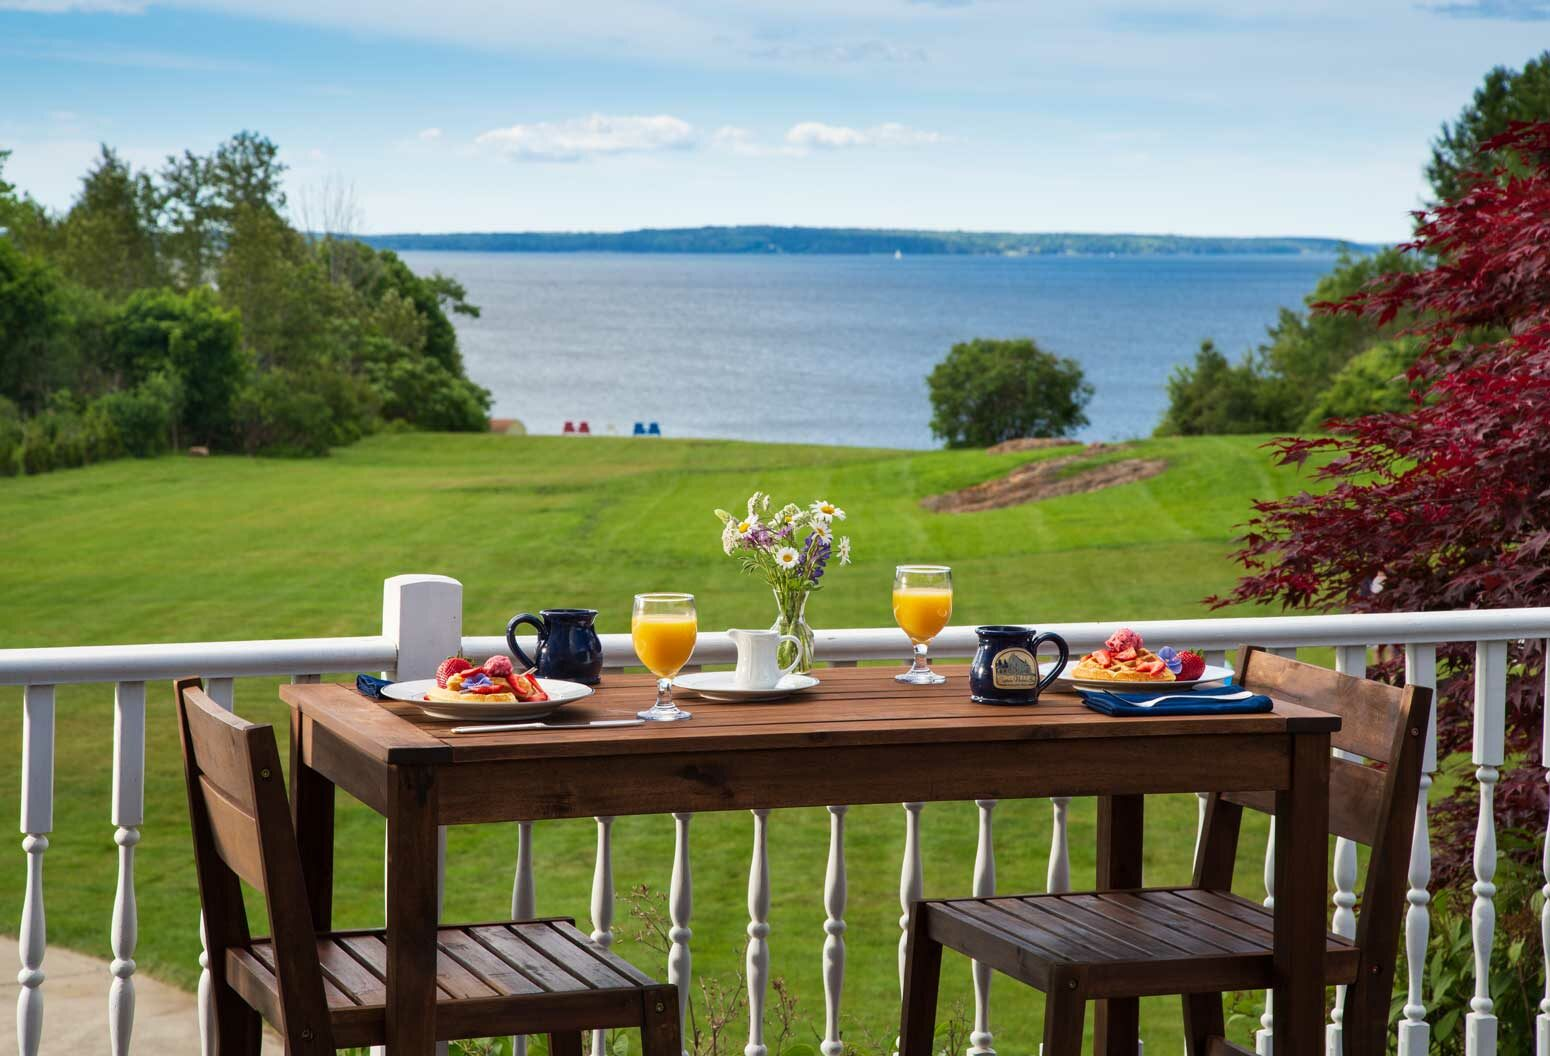 Enjoy the water view while enjoying breakfast